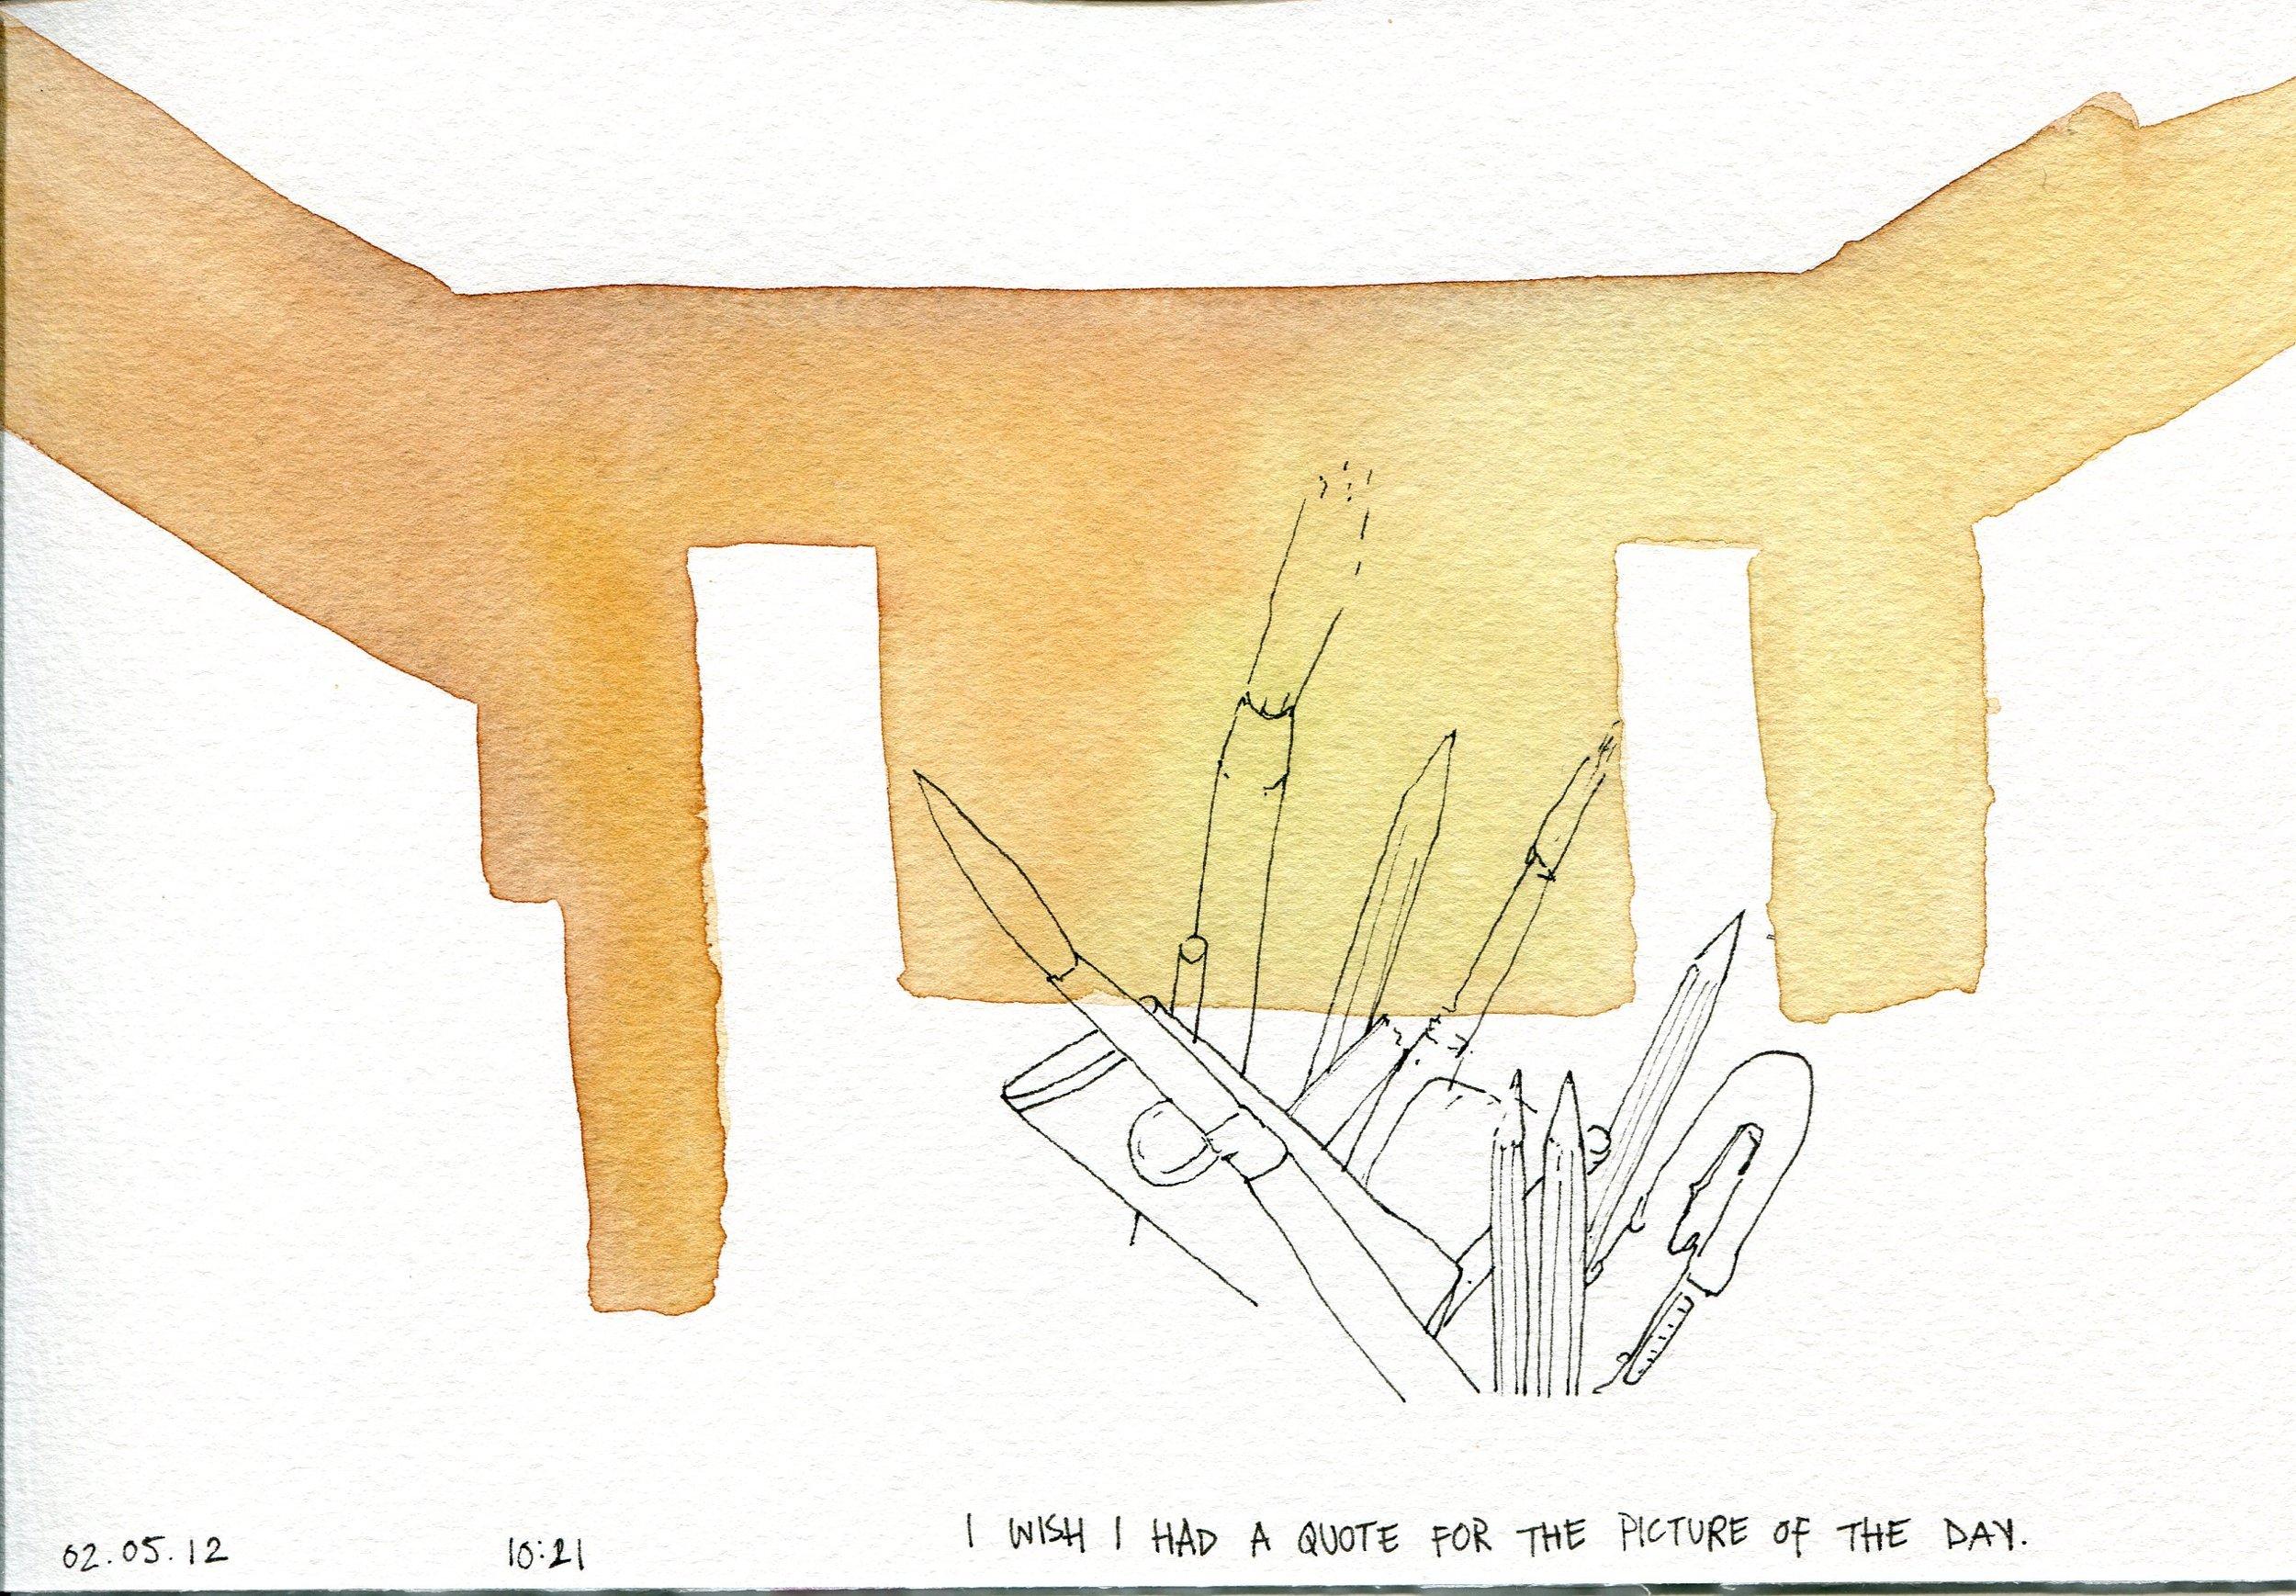 2012-02-10 drawing001.jpg